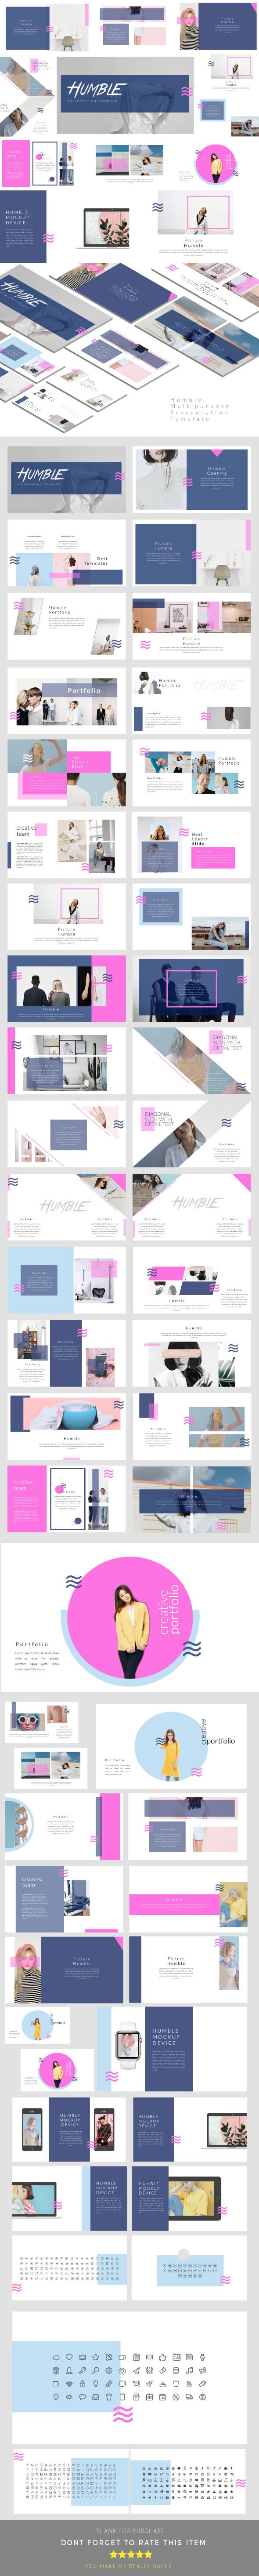 Humble - Keynote Templates - Keynote Templates Presentation Templates